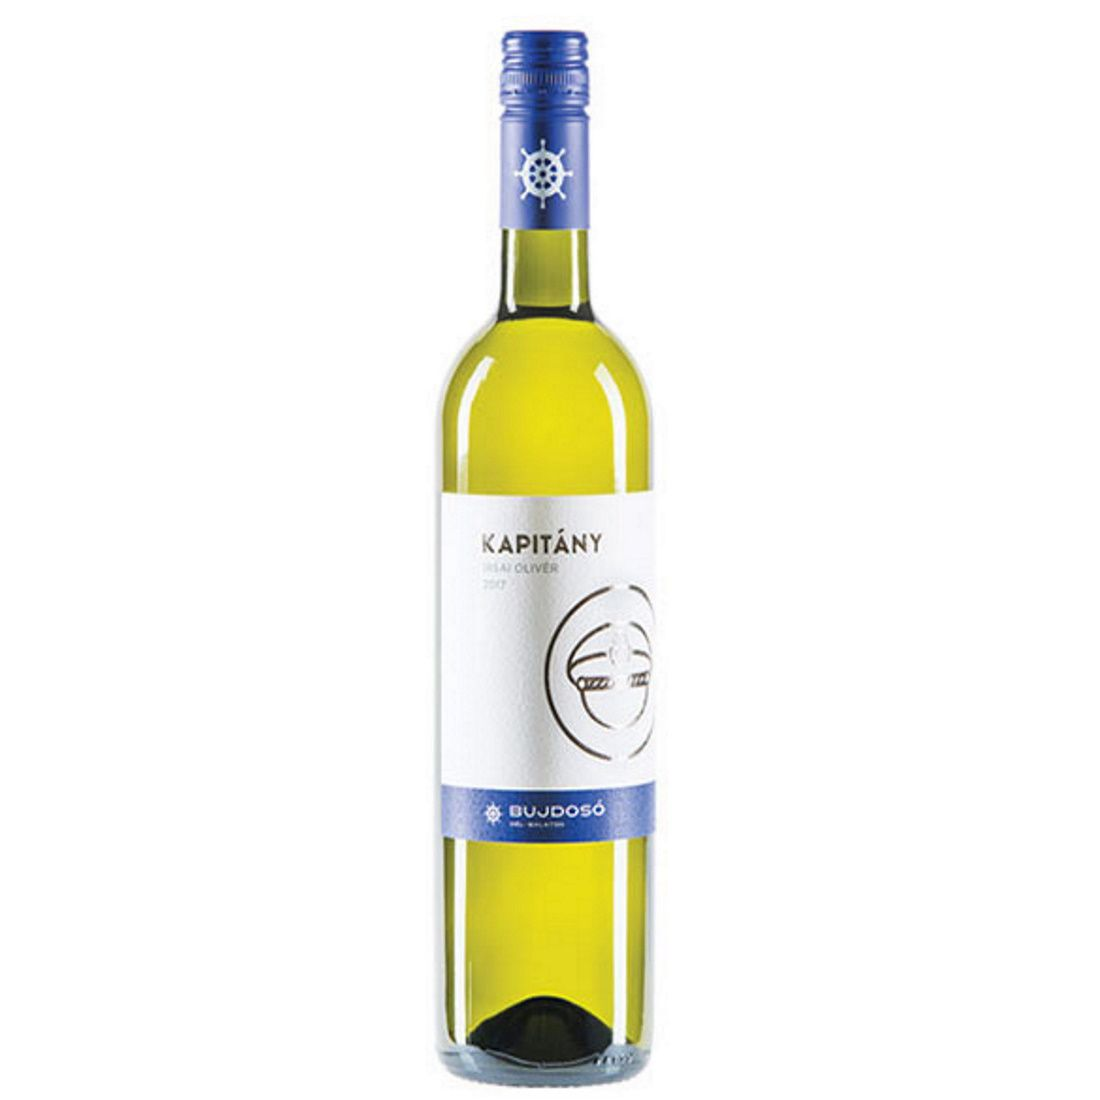 Bujdosó Kapitány Irsai Olivér 2020 0,75 Balaton